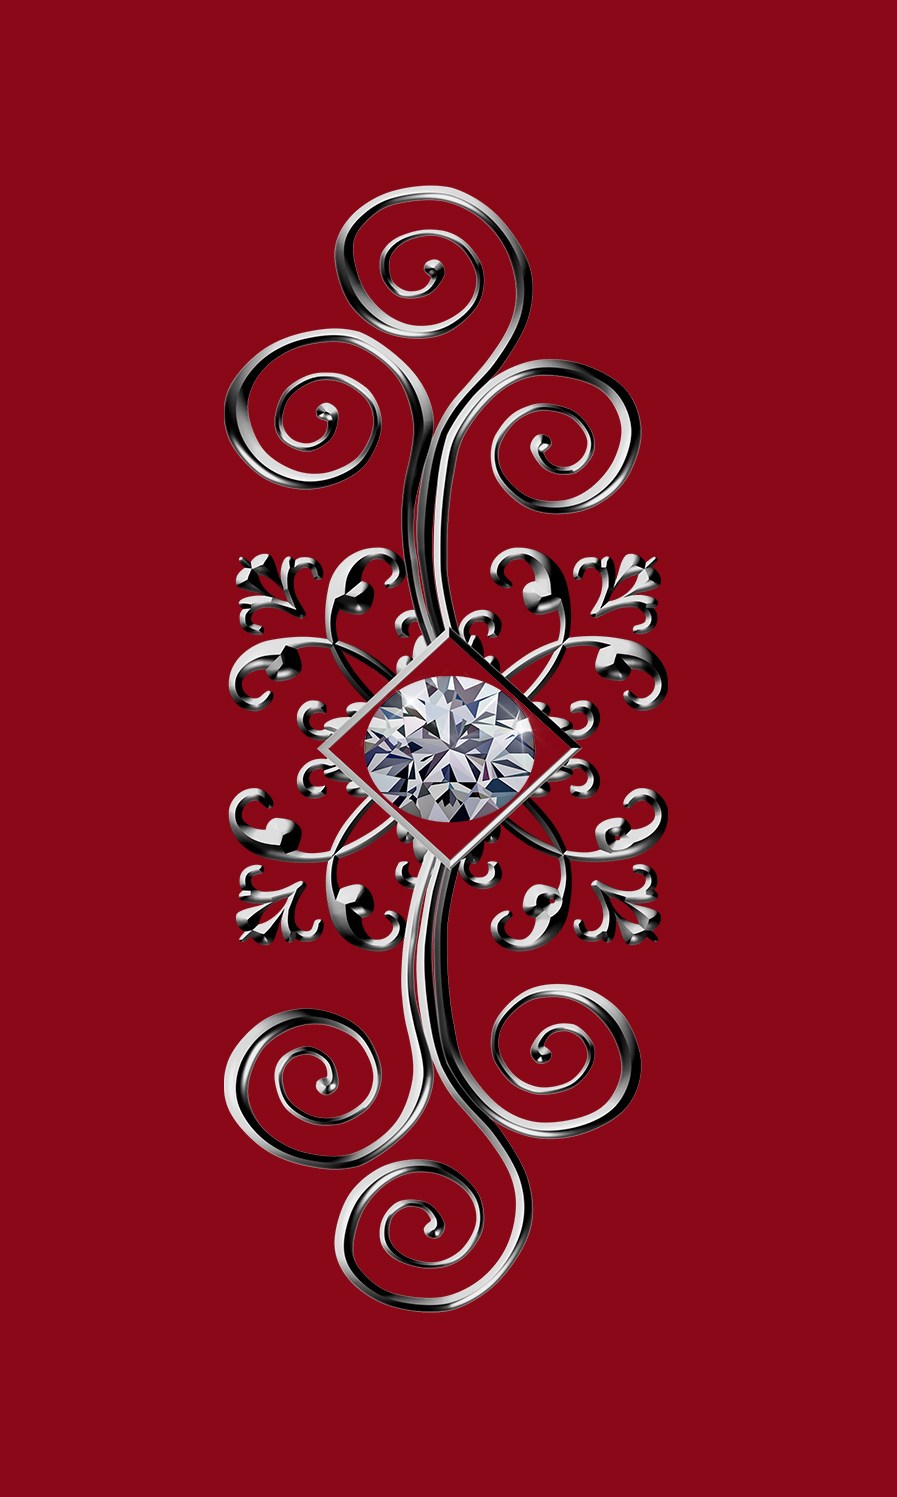 Custom Tarot Card Back Designs by Pennie McCracken - Endless Skys